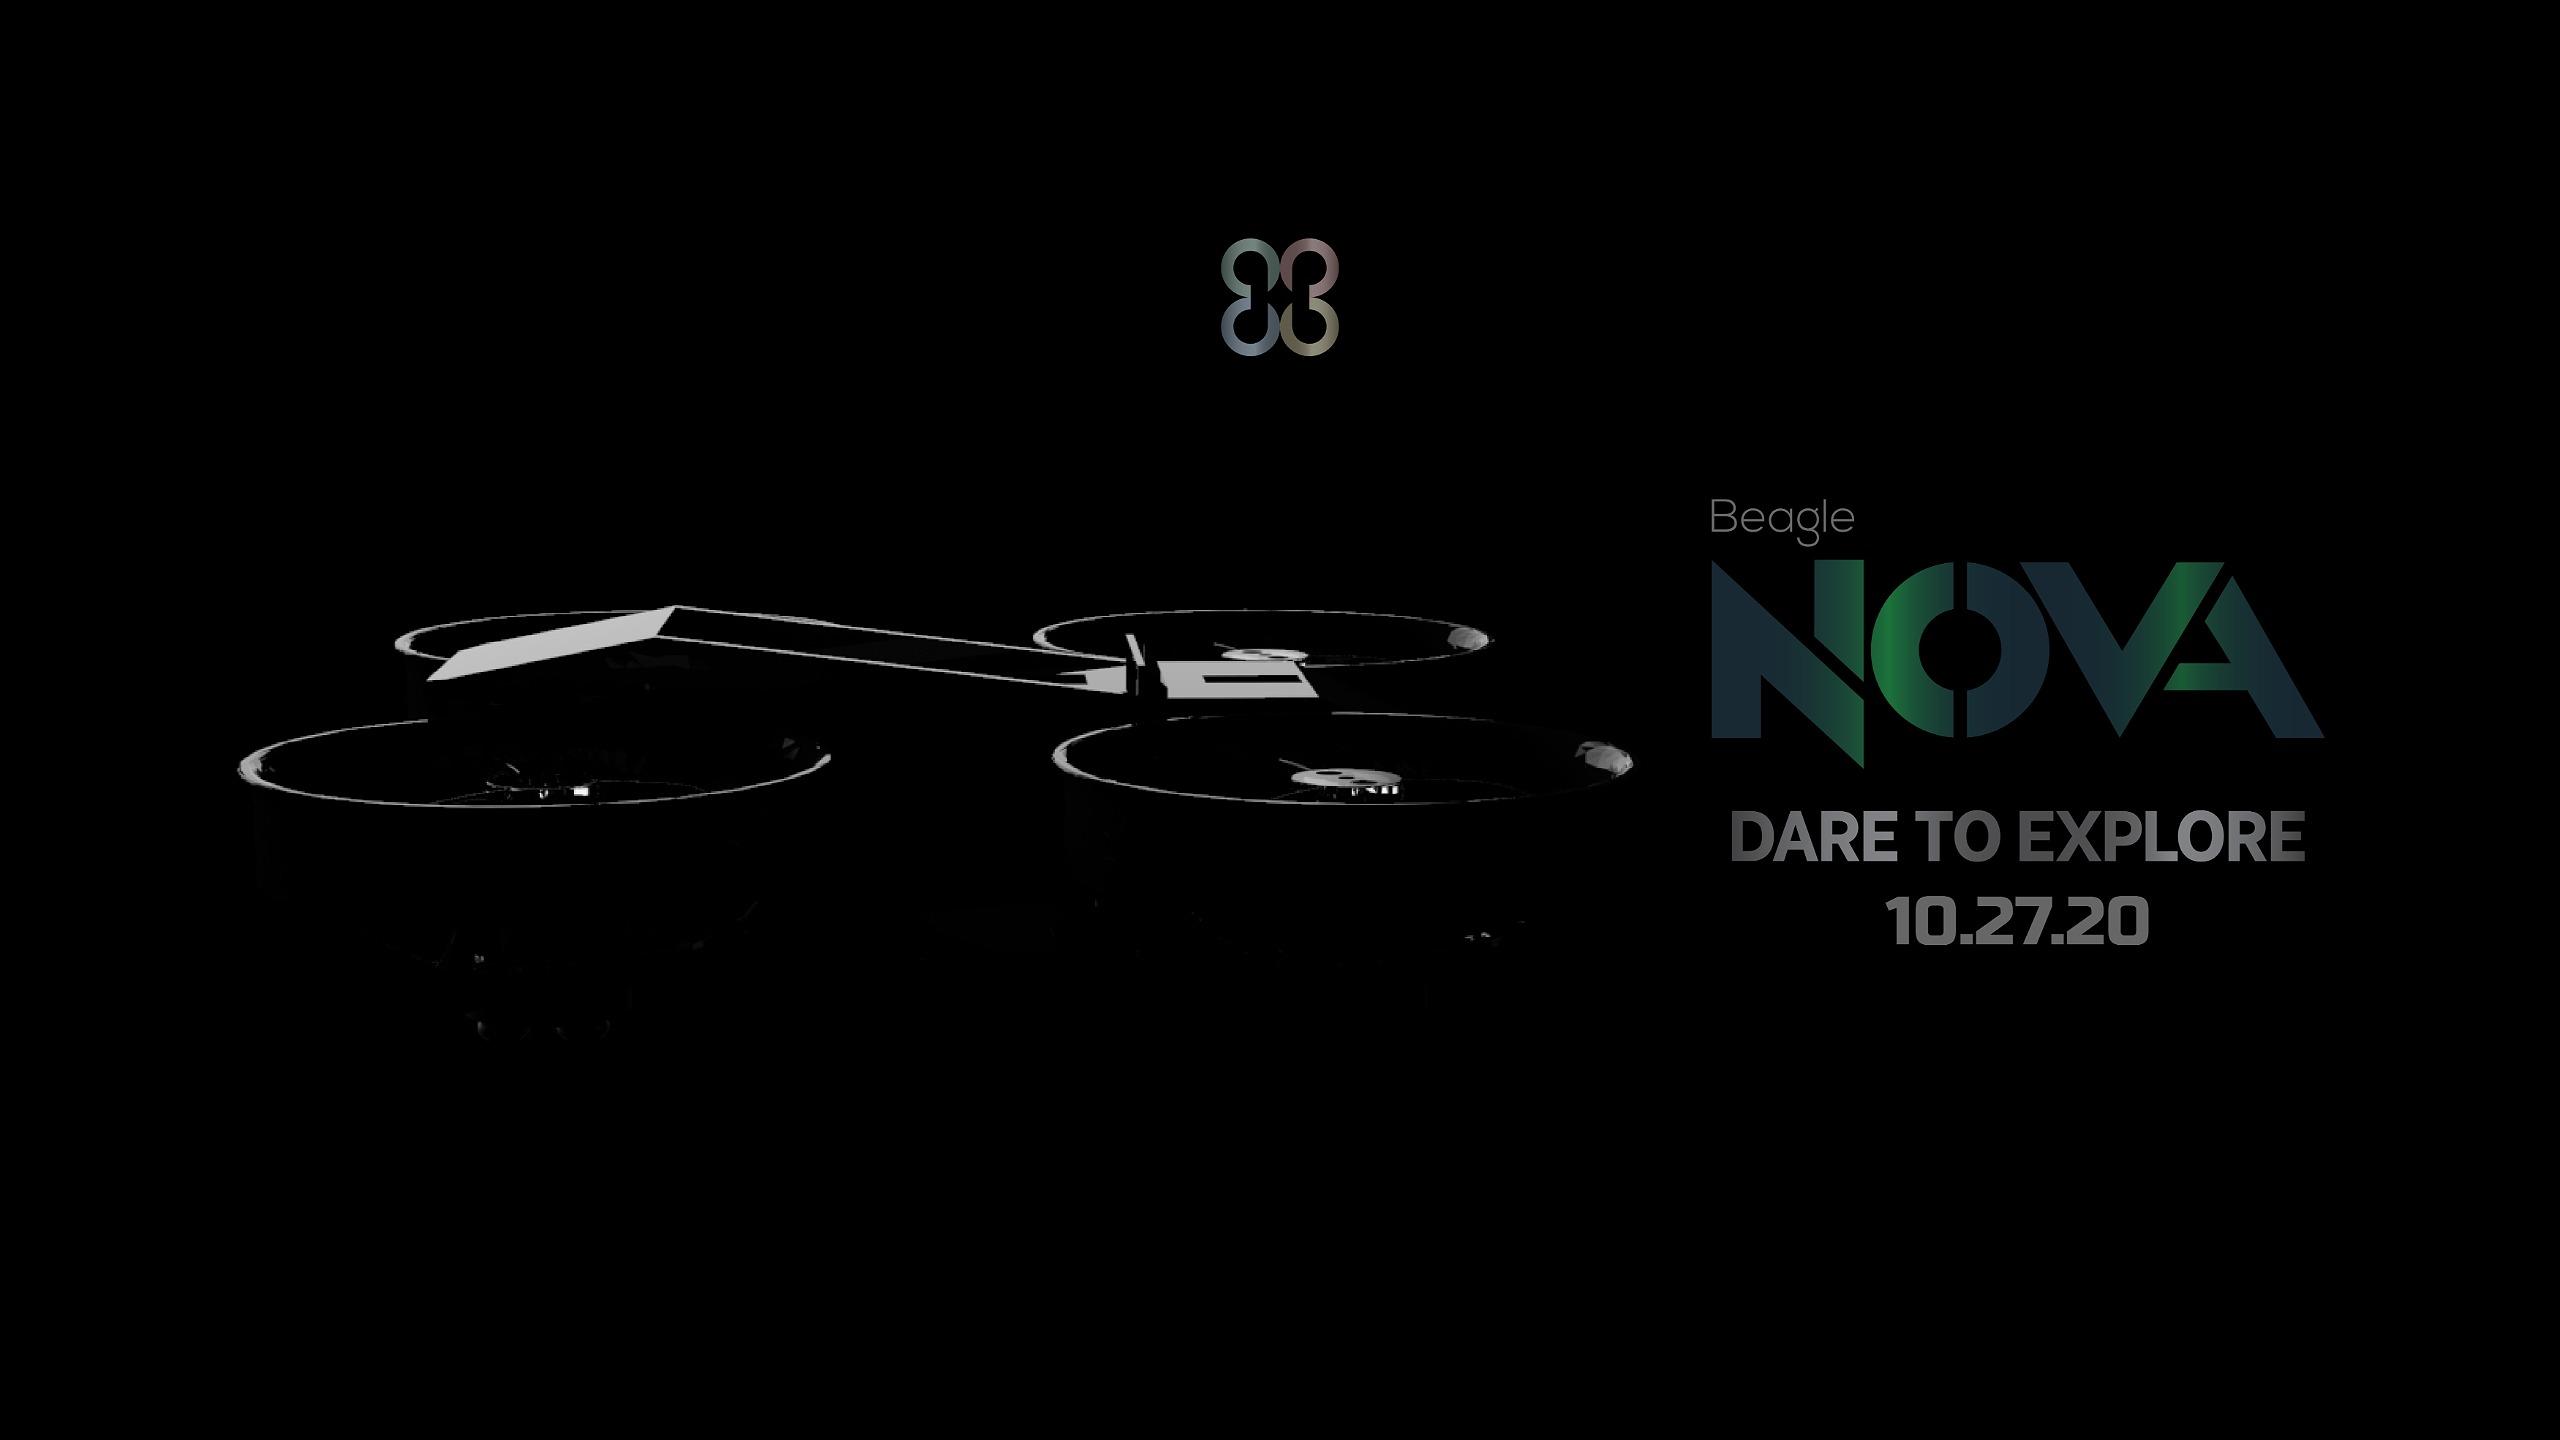 Beagle Drones Nova CineWhoop